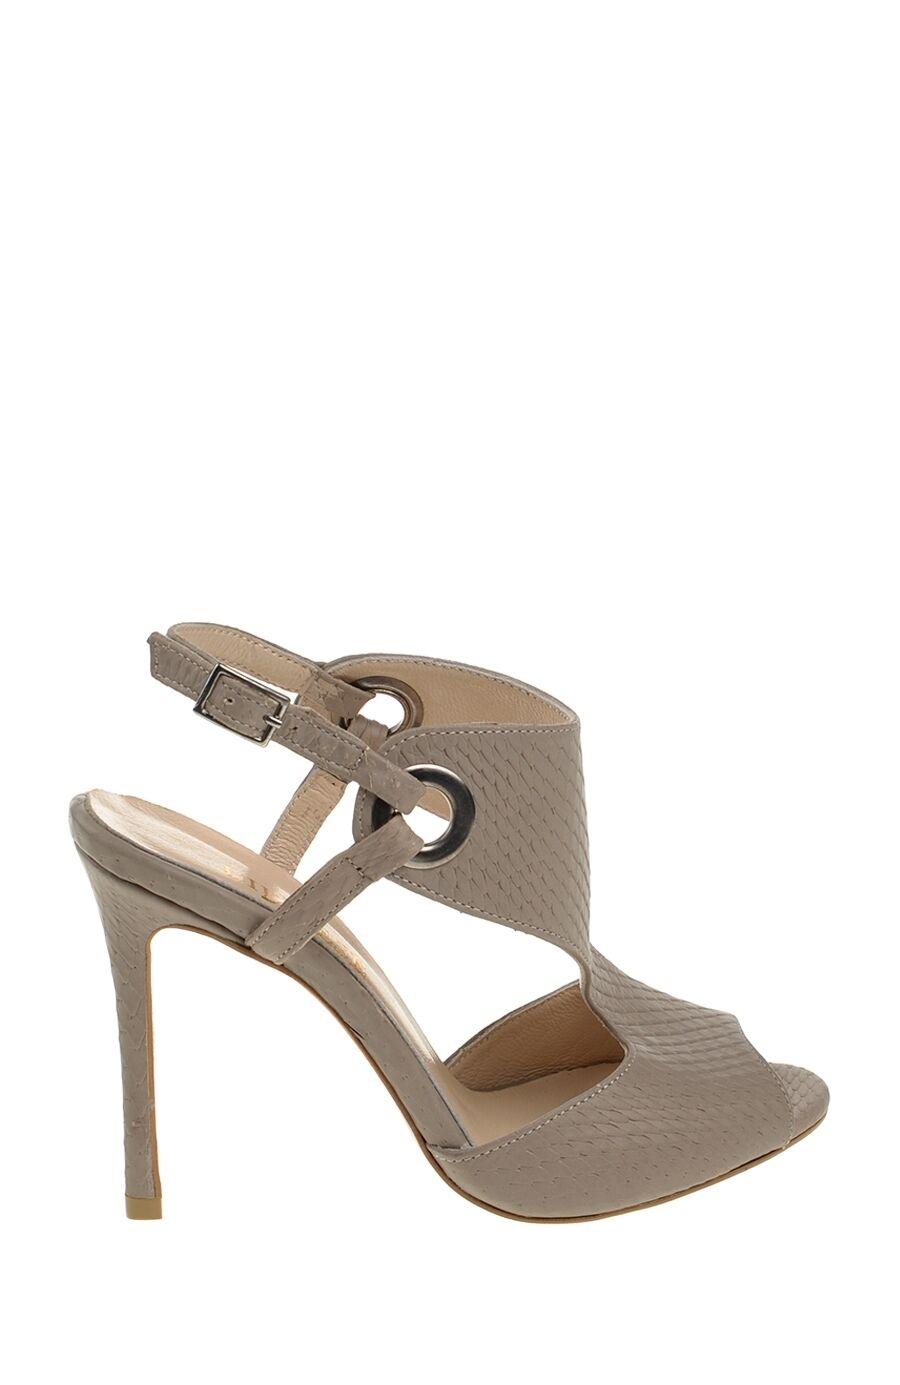 Topuklu Vizon Deri Ayakkabı